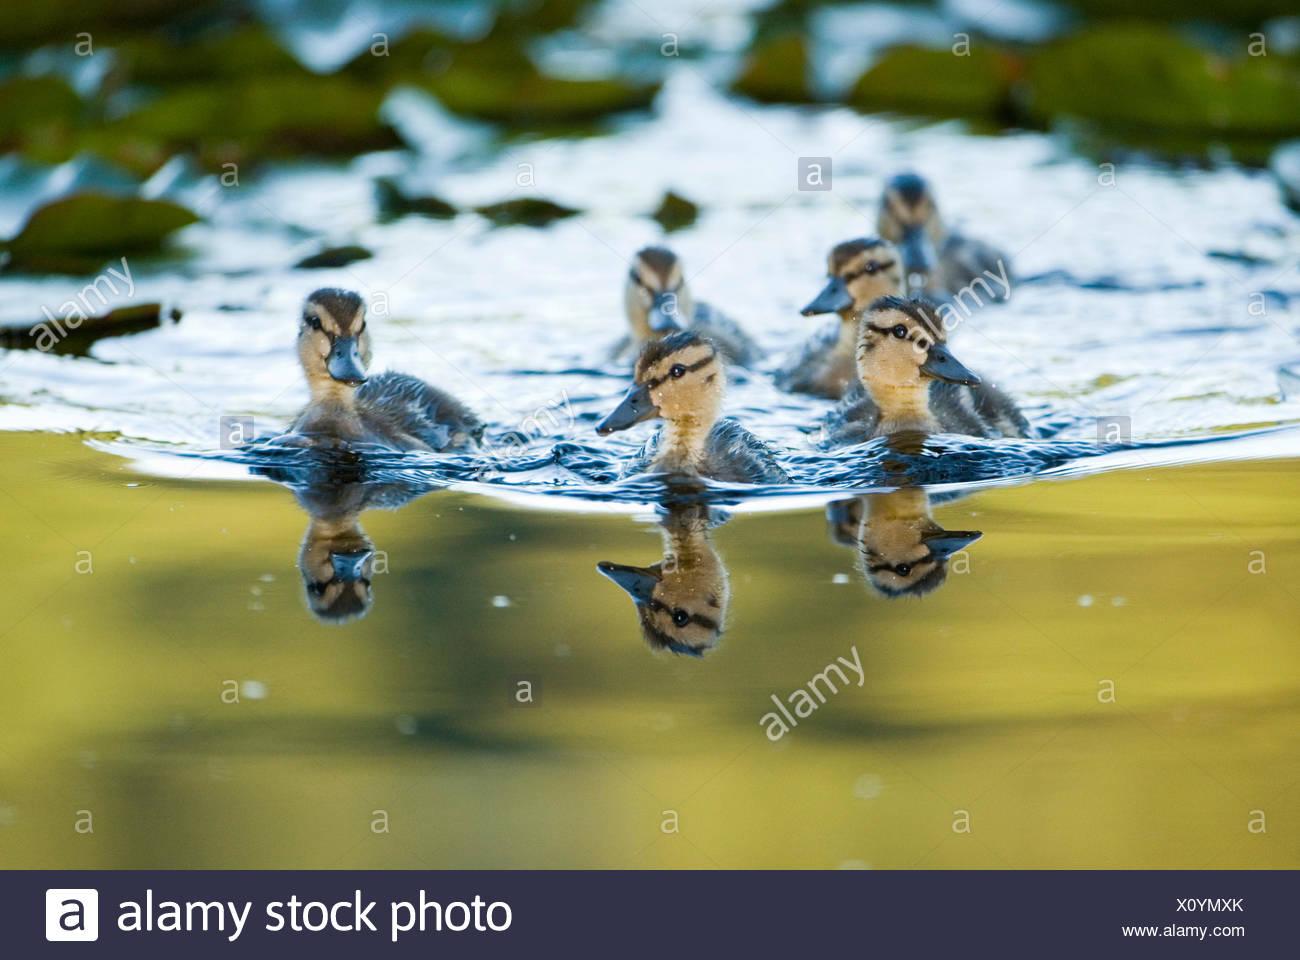 Mallard ducklings, Anas platyrhynchos, in the water. - Stock Image